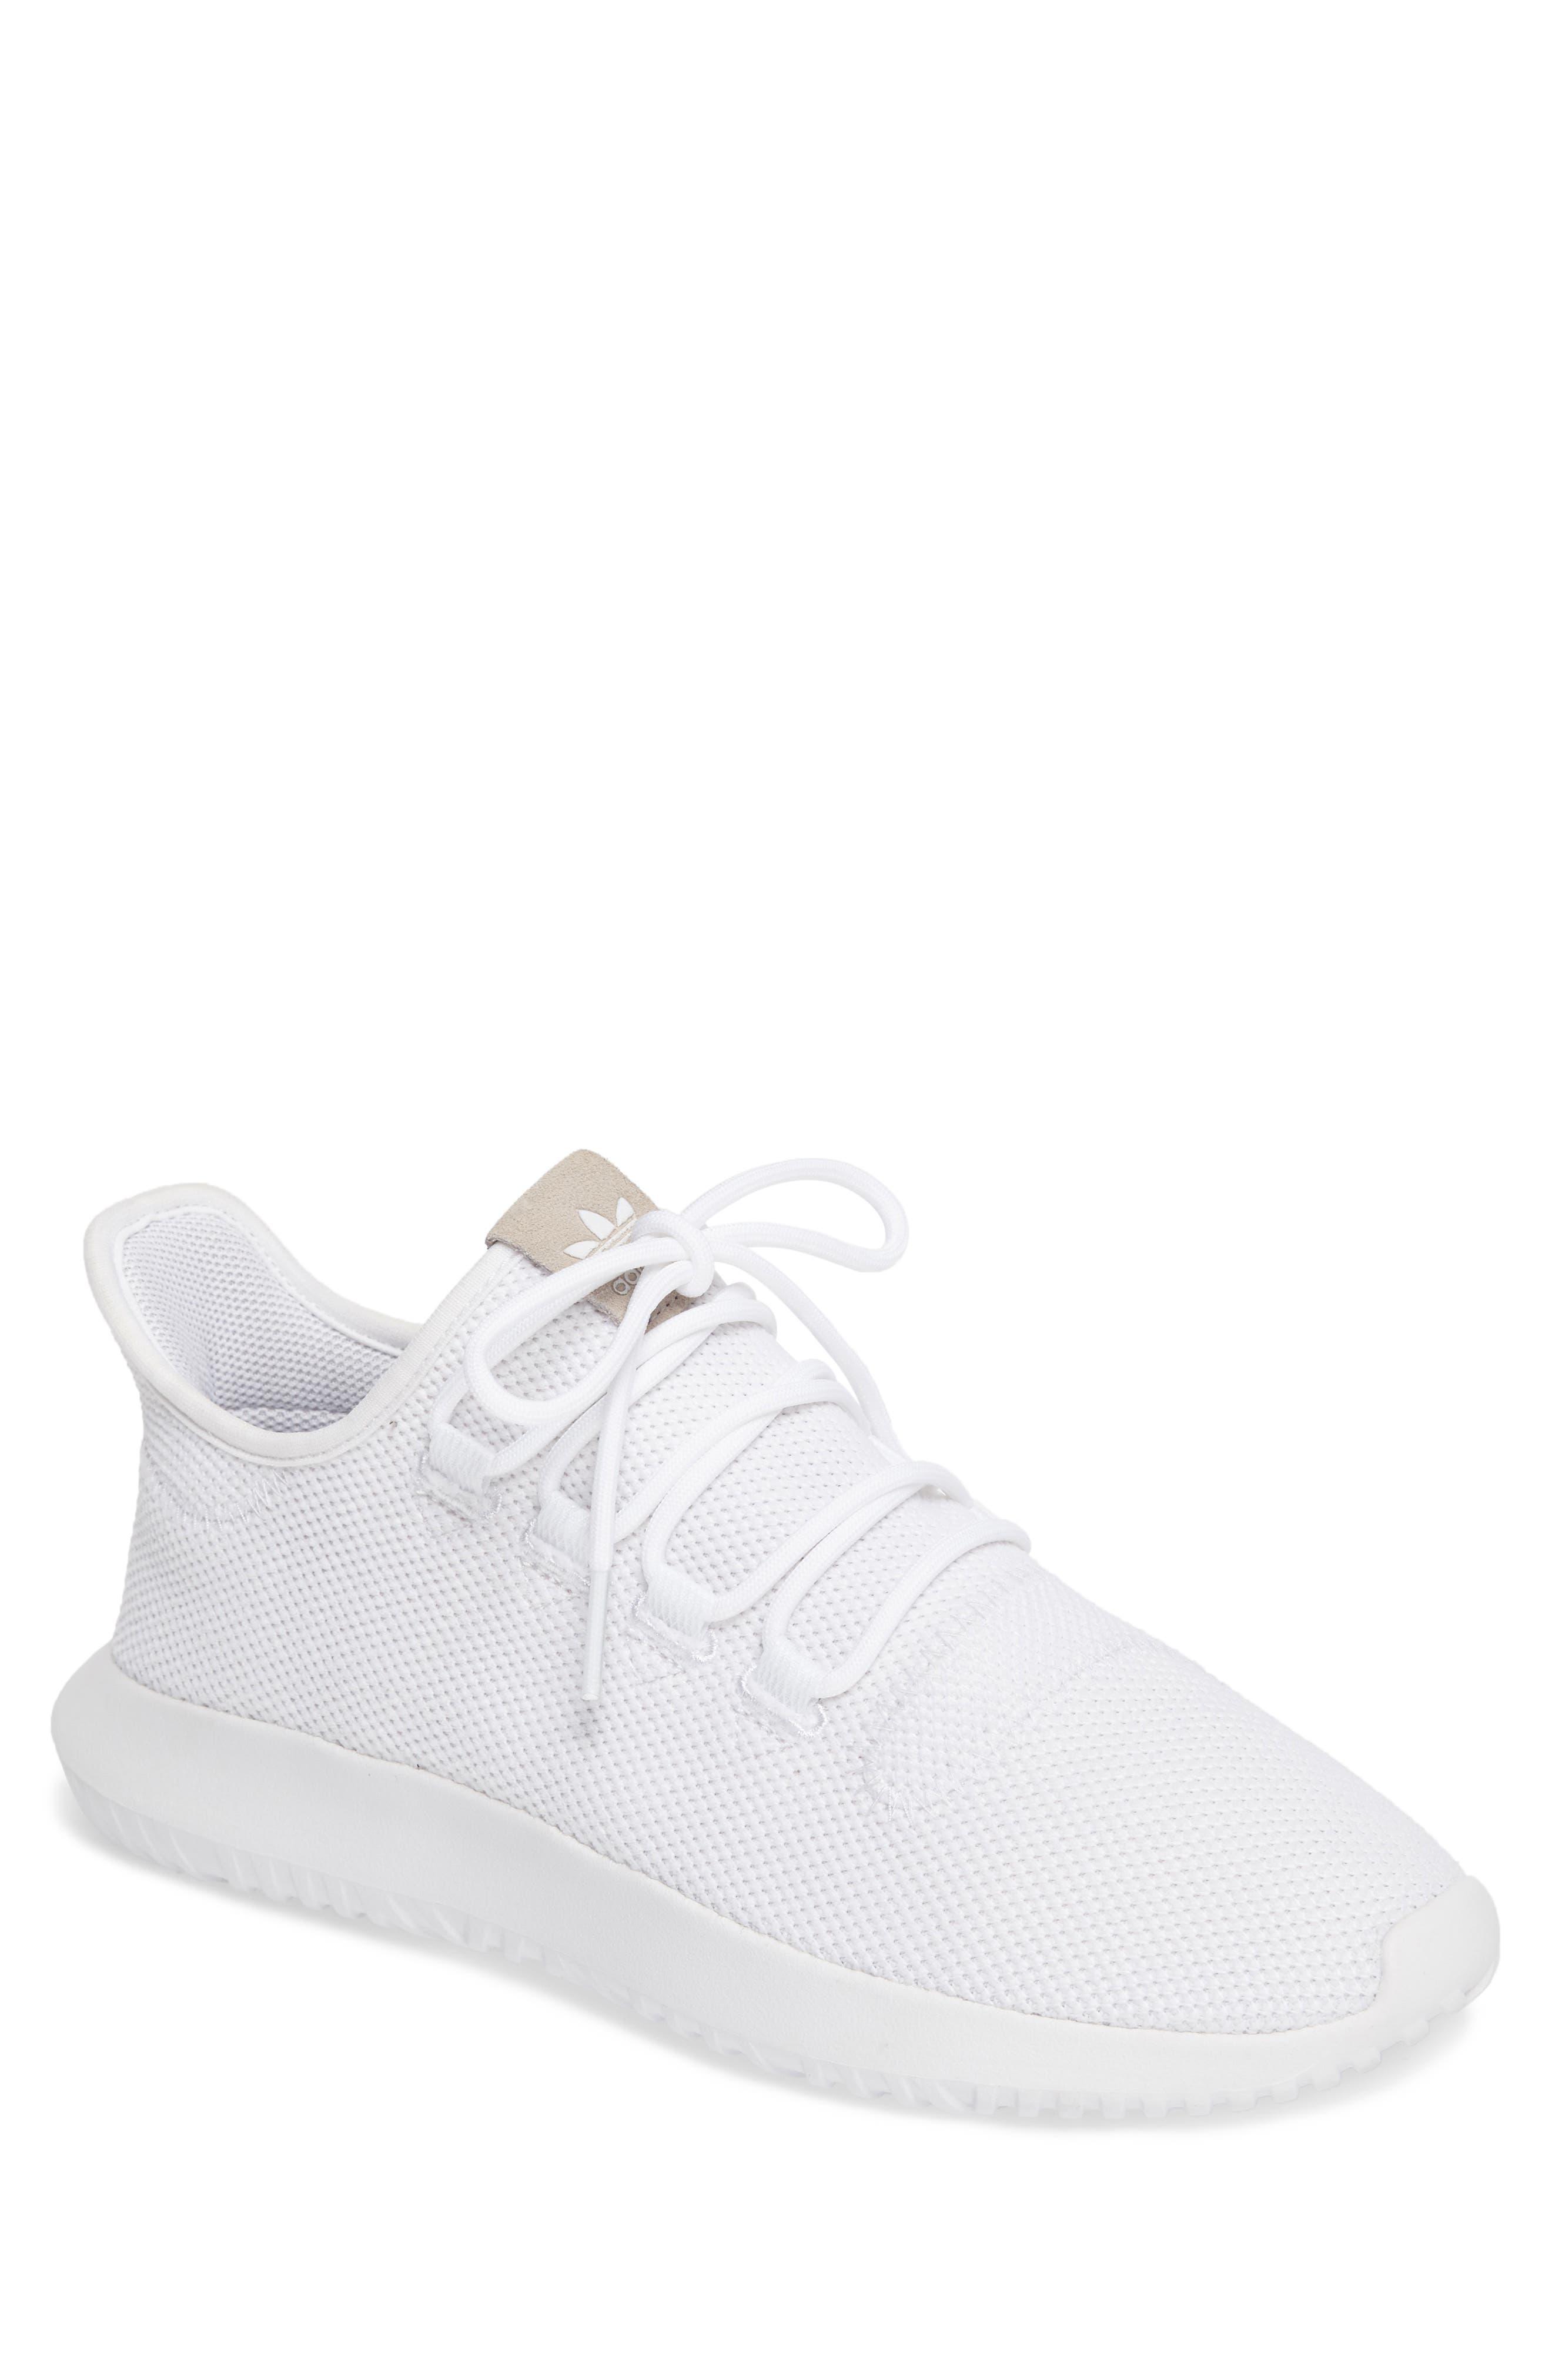 adidas Tubular Shadow Sneaker (Men)